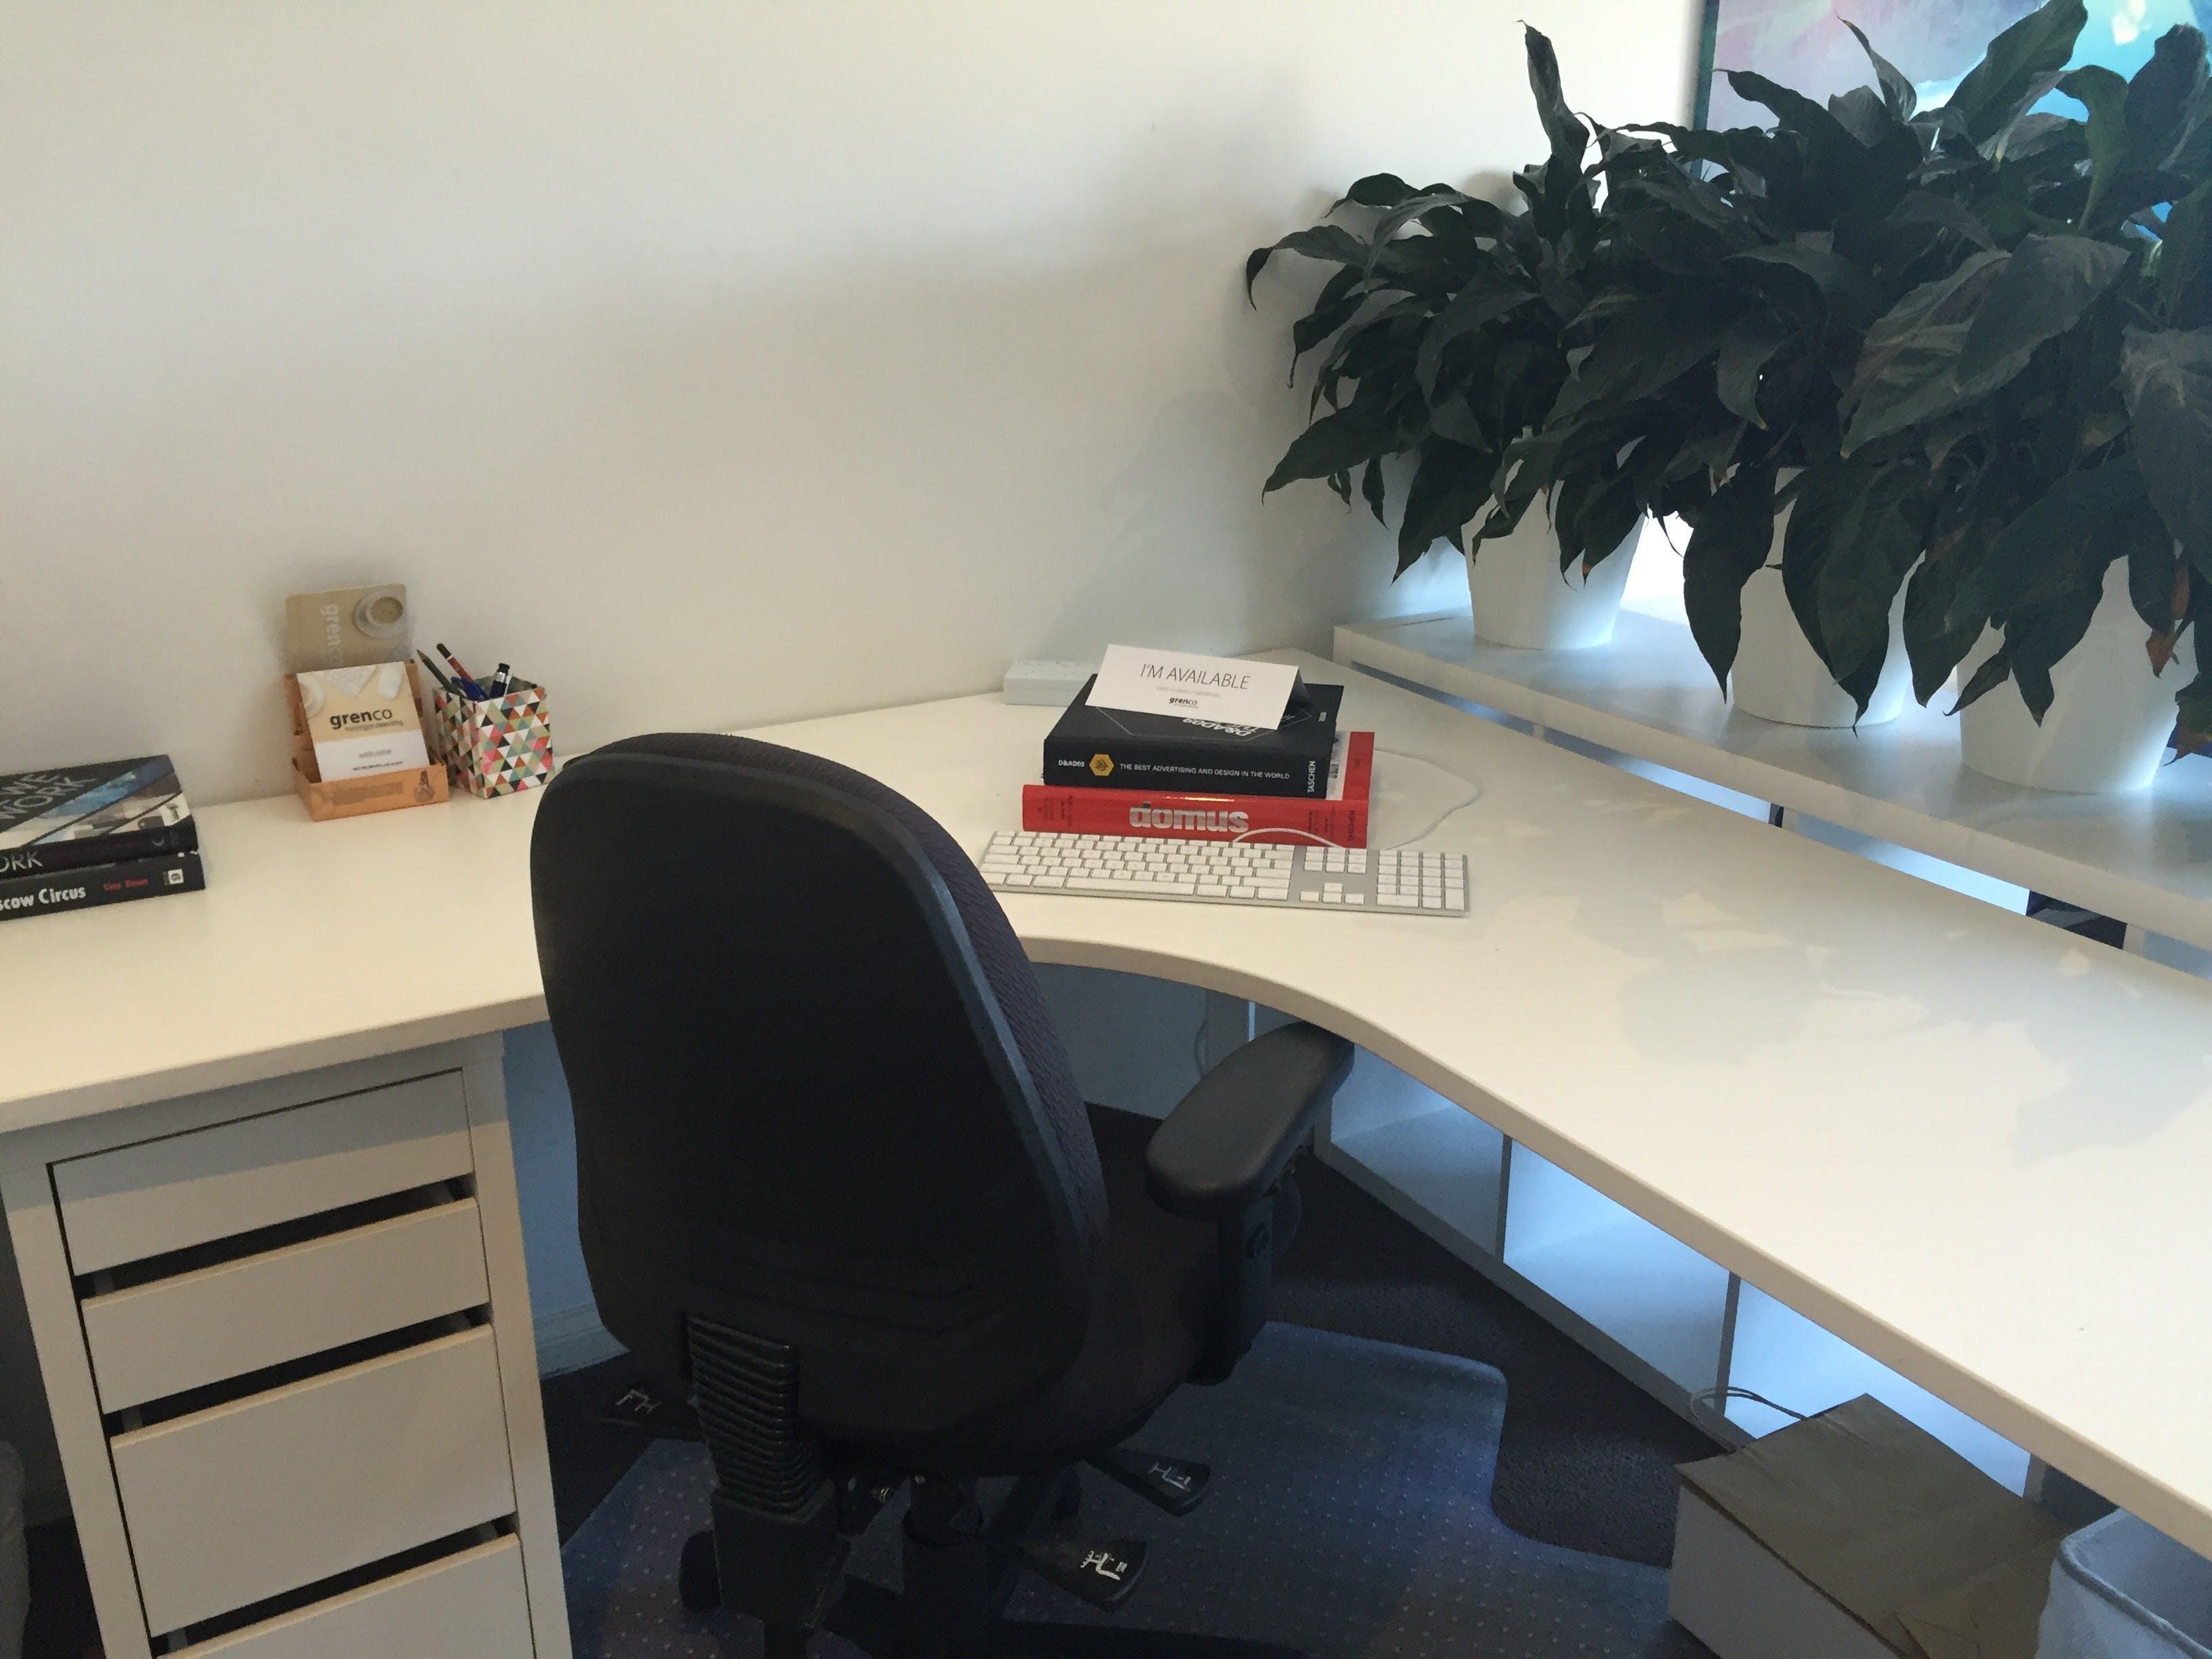 Hot desk at Grenco, image 1